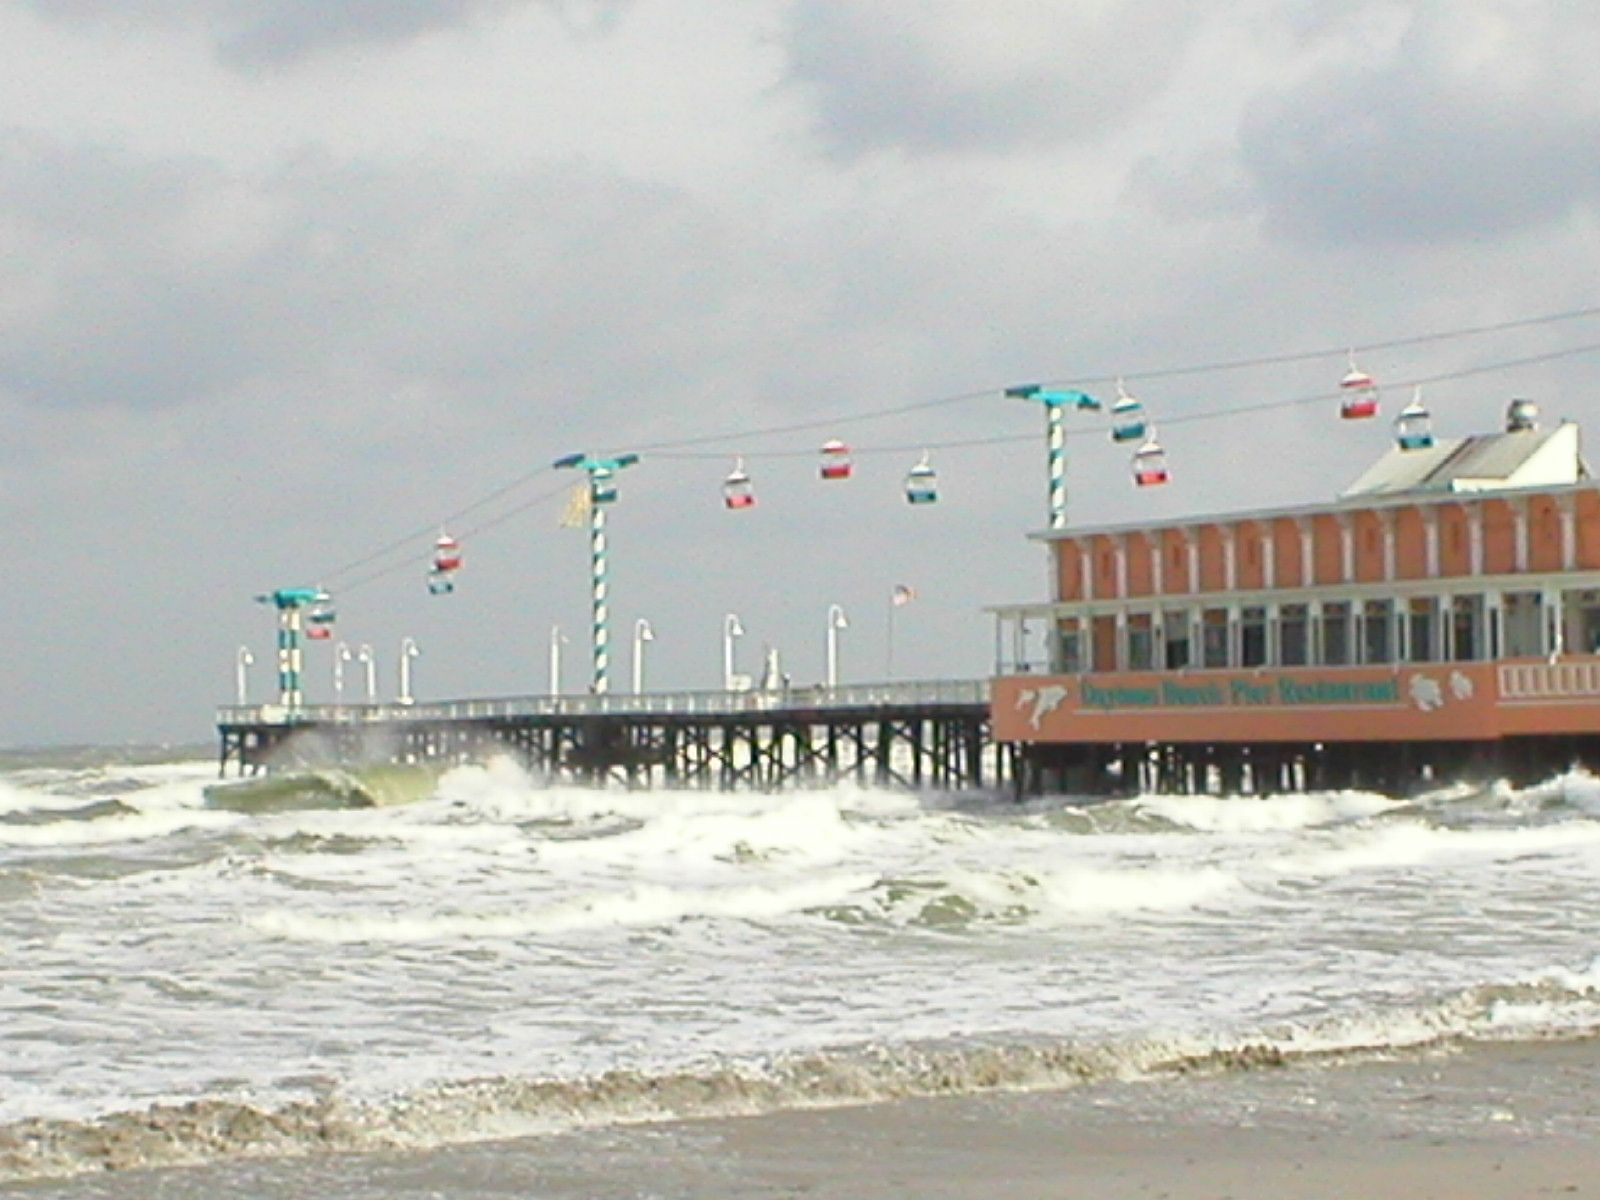 Daytona Beach Daytona beach florida, Daytona beach